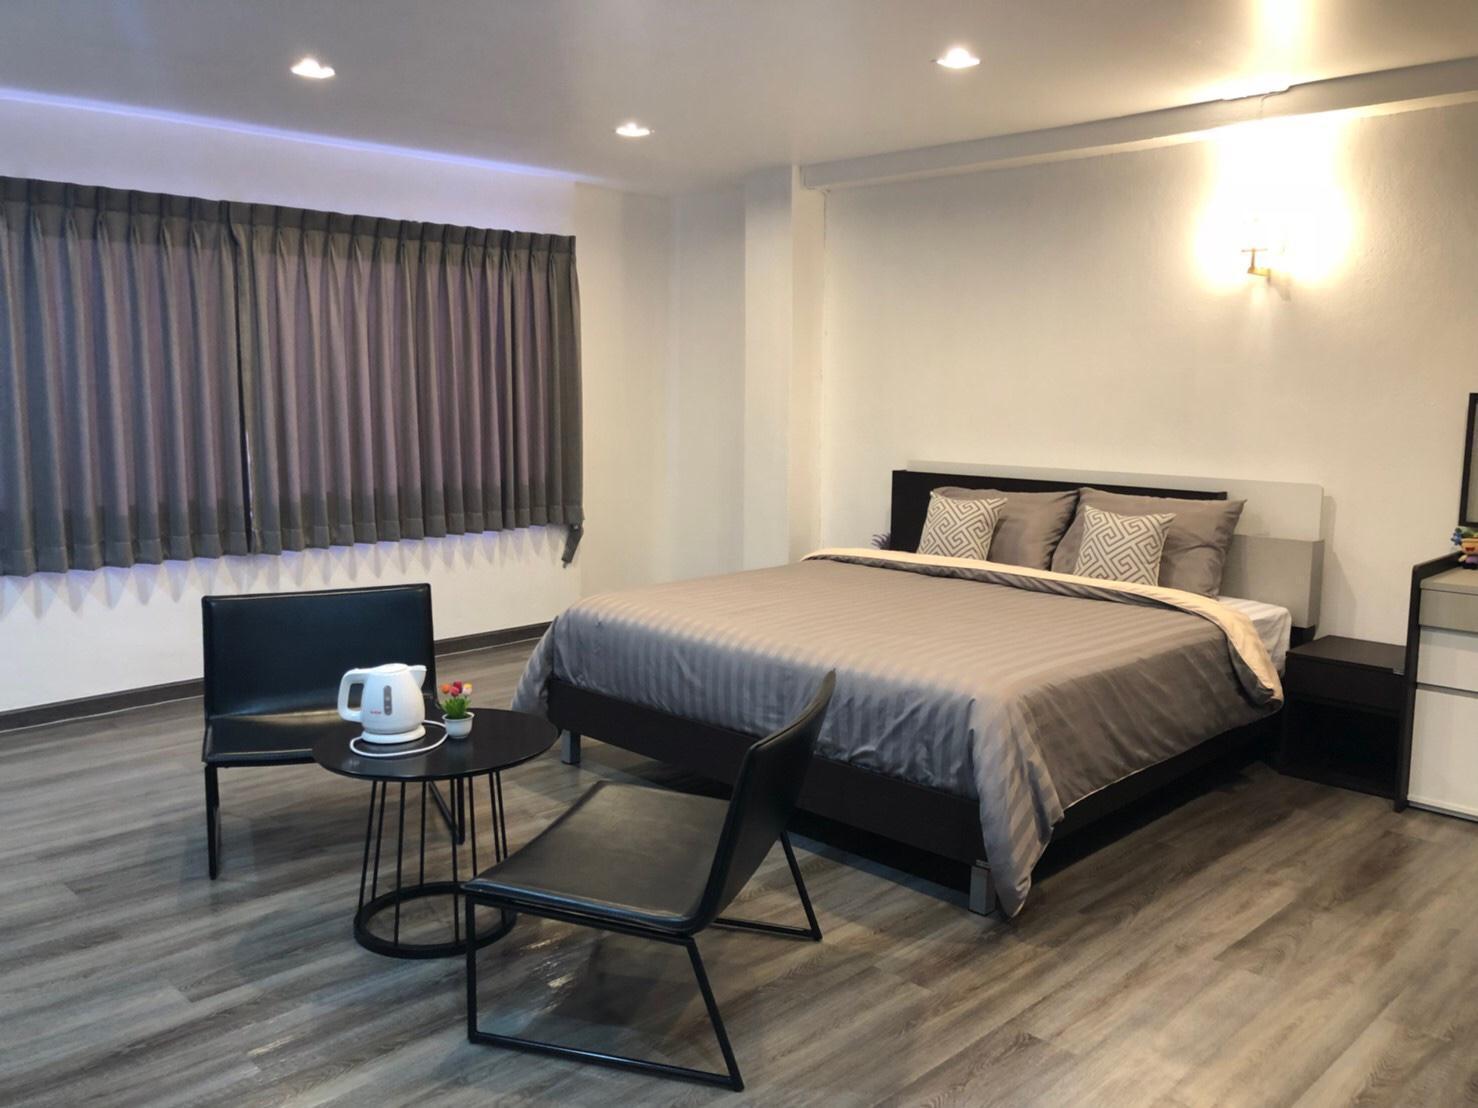 Best and cheap private room near Khaosan! 401 สตูดิโอ อพาร์ตเมนต์ 1 ห้องน้ำส่วนตัว ขนาด 17 ตร.ม. – เยาวราช